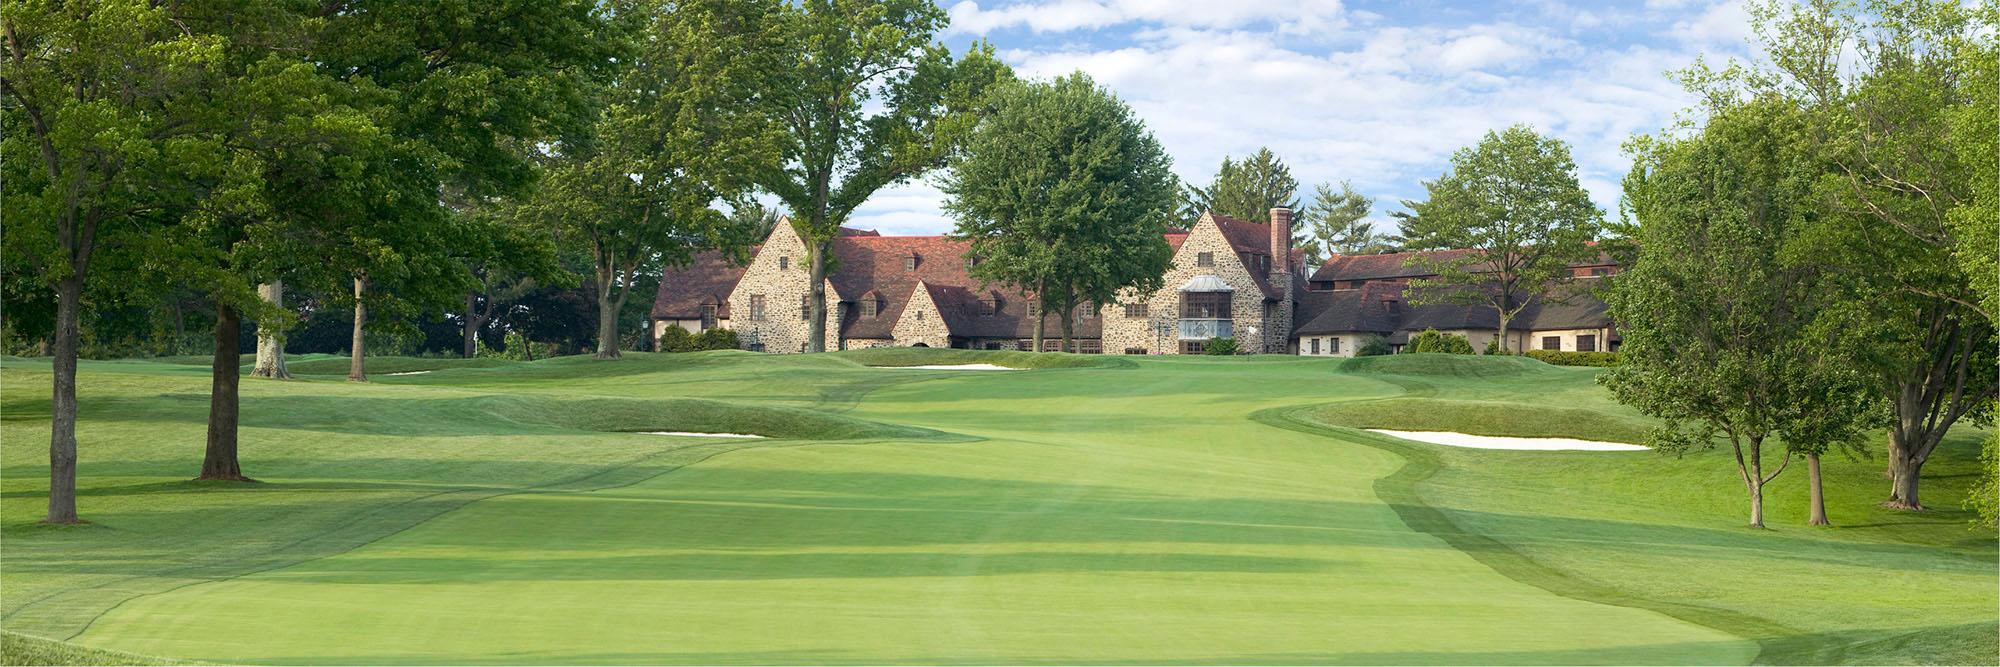 Golf Course Image - Aronimink No. 9